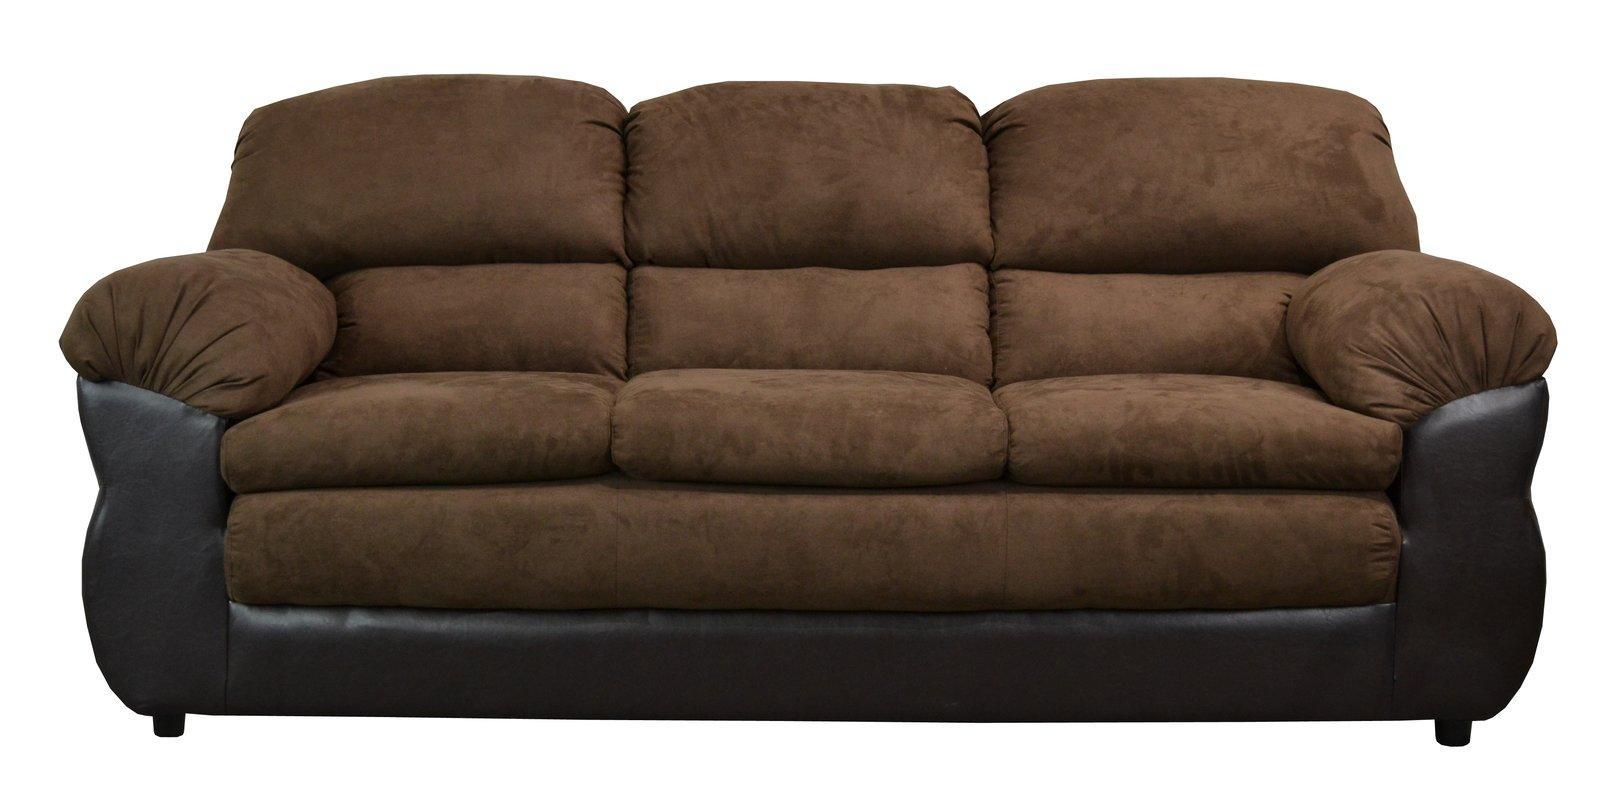 Piedmont Furniture Abigail Sofa & Reviews | Wayfair Throughout Piedmont Sofas (Image 7 of 20)